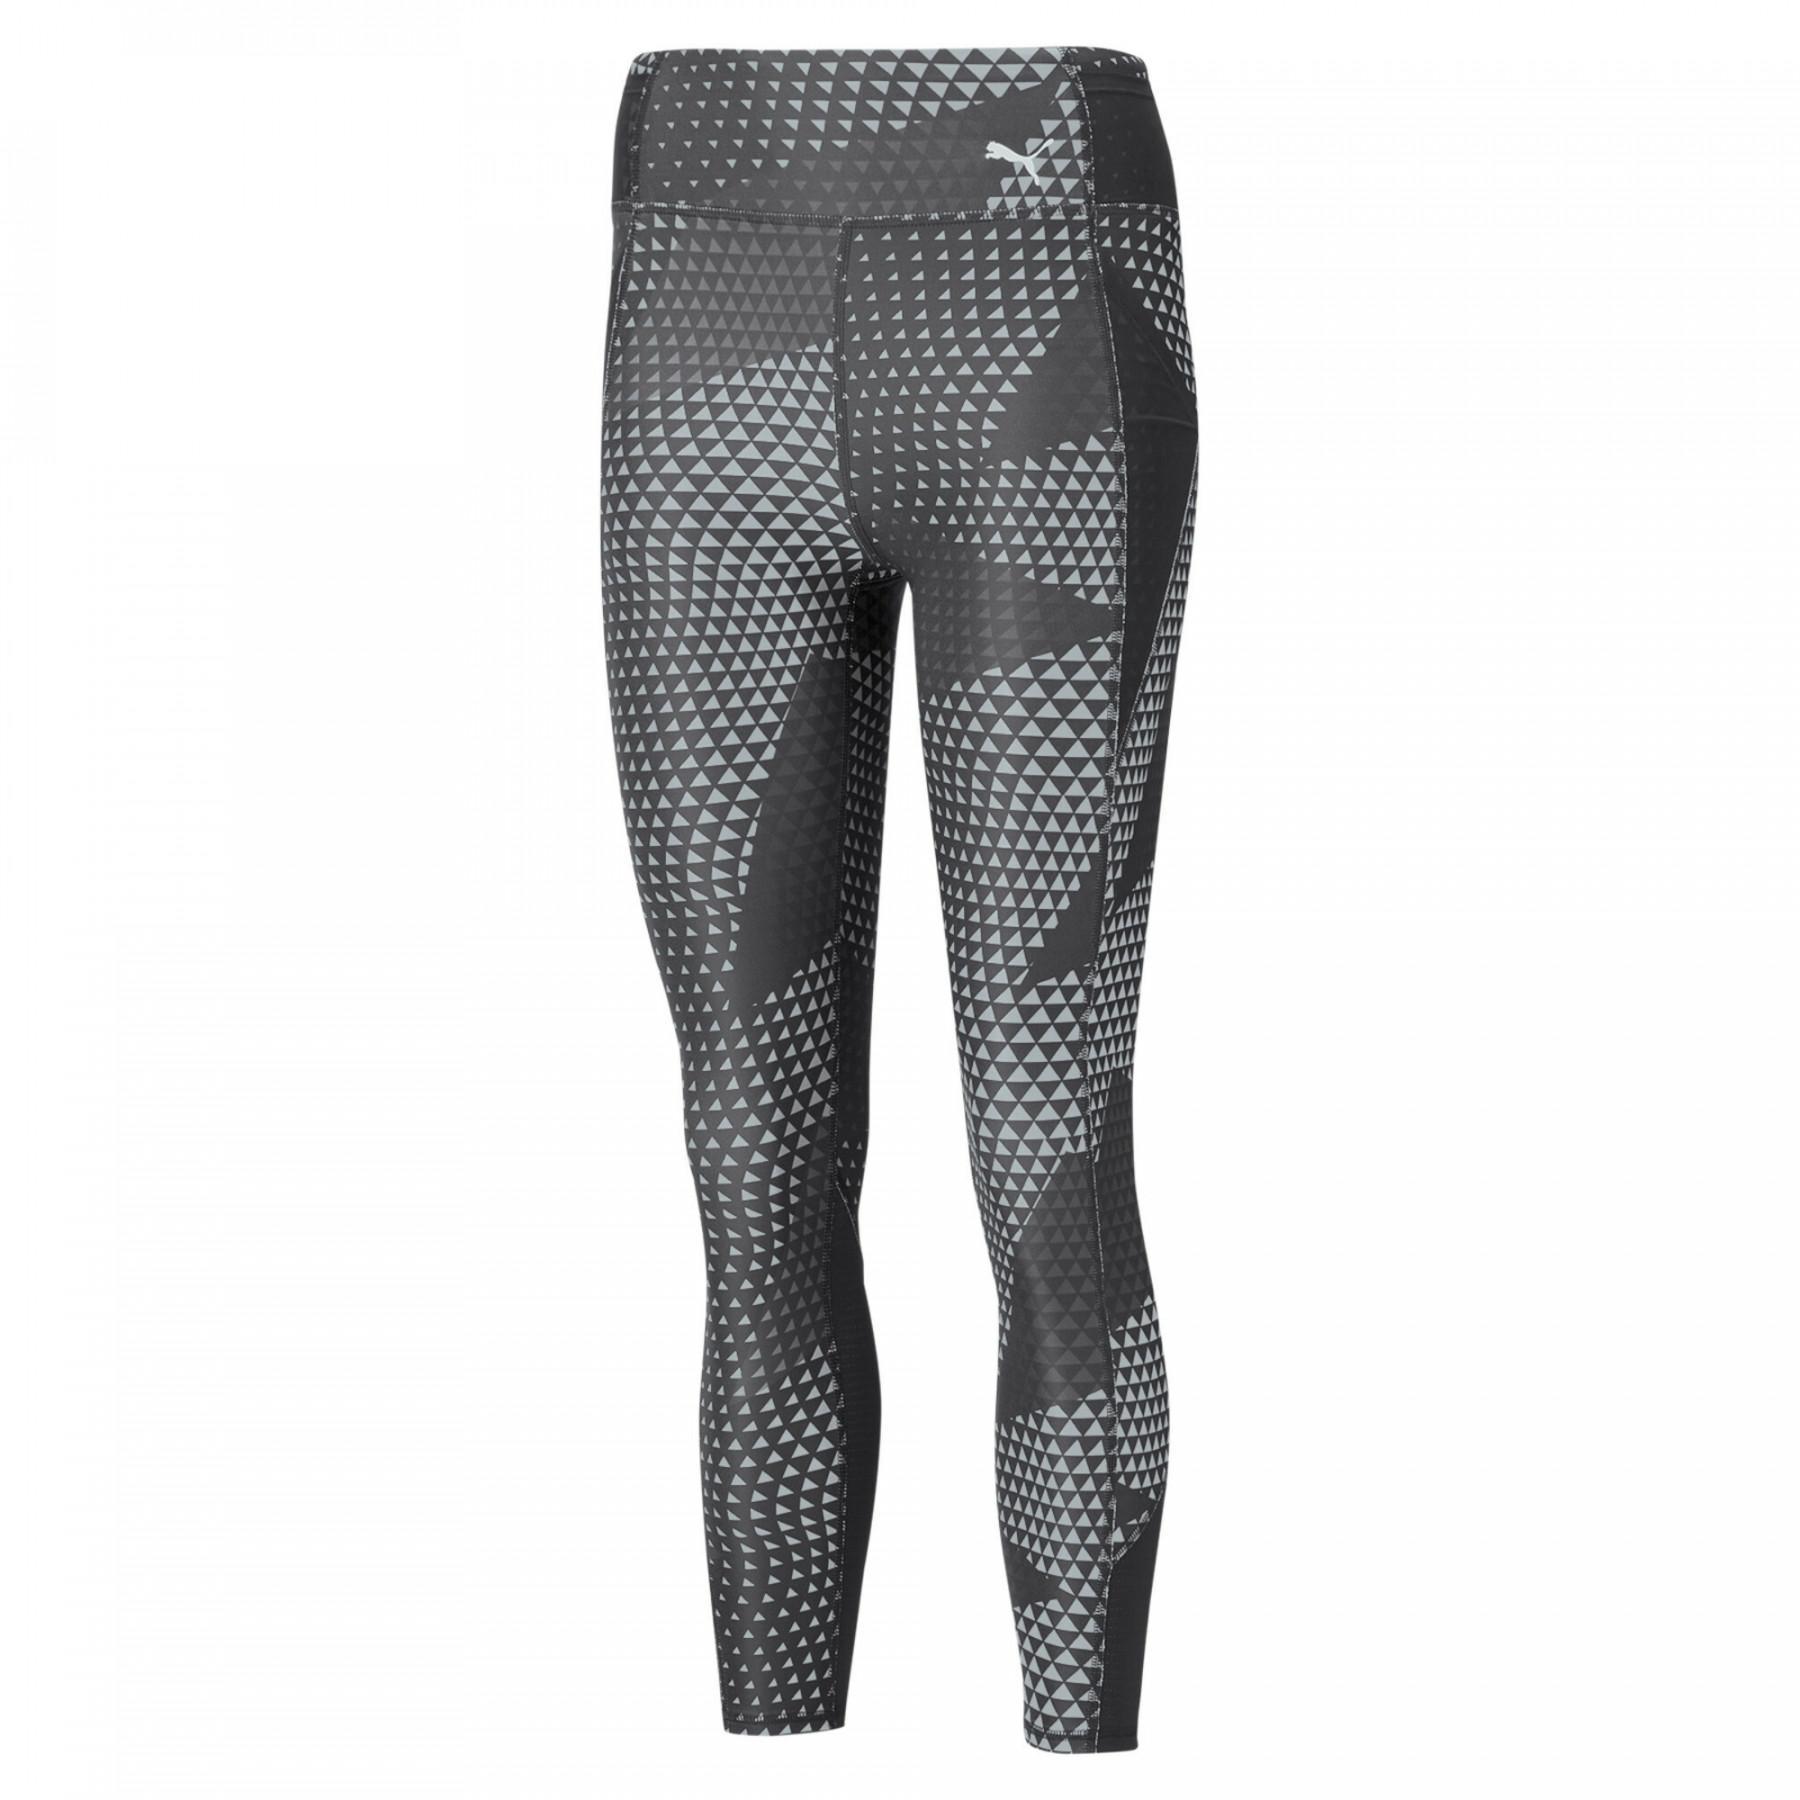 Women's high waist Puma Train Favorite AOP 7/8 leggings